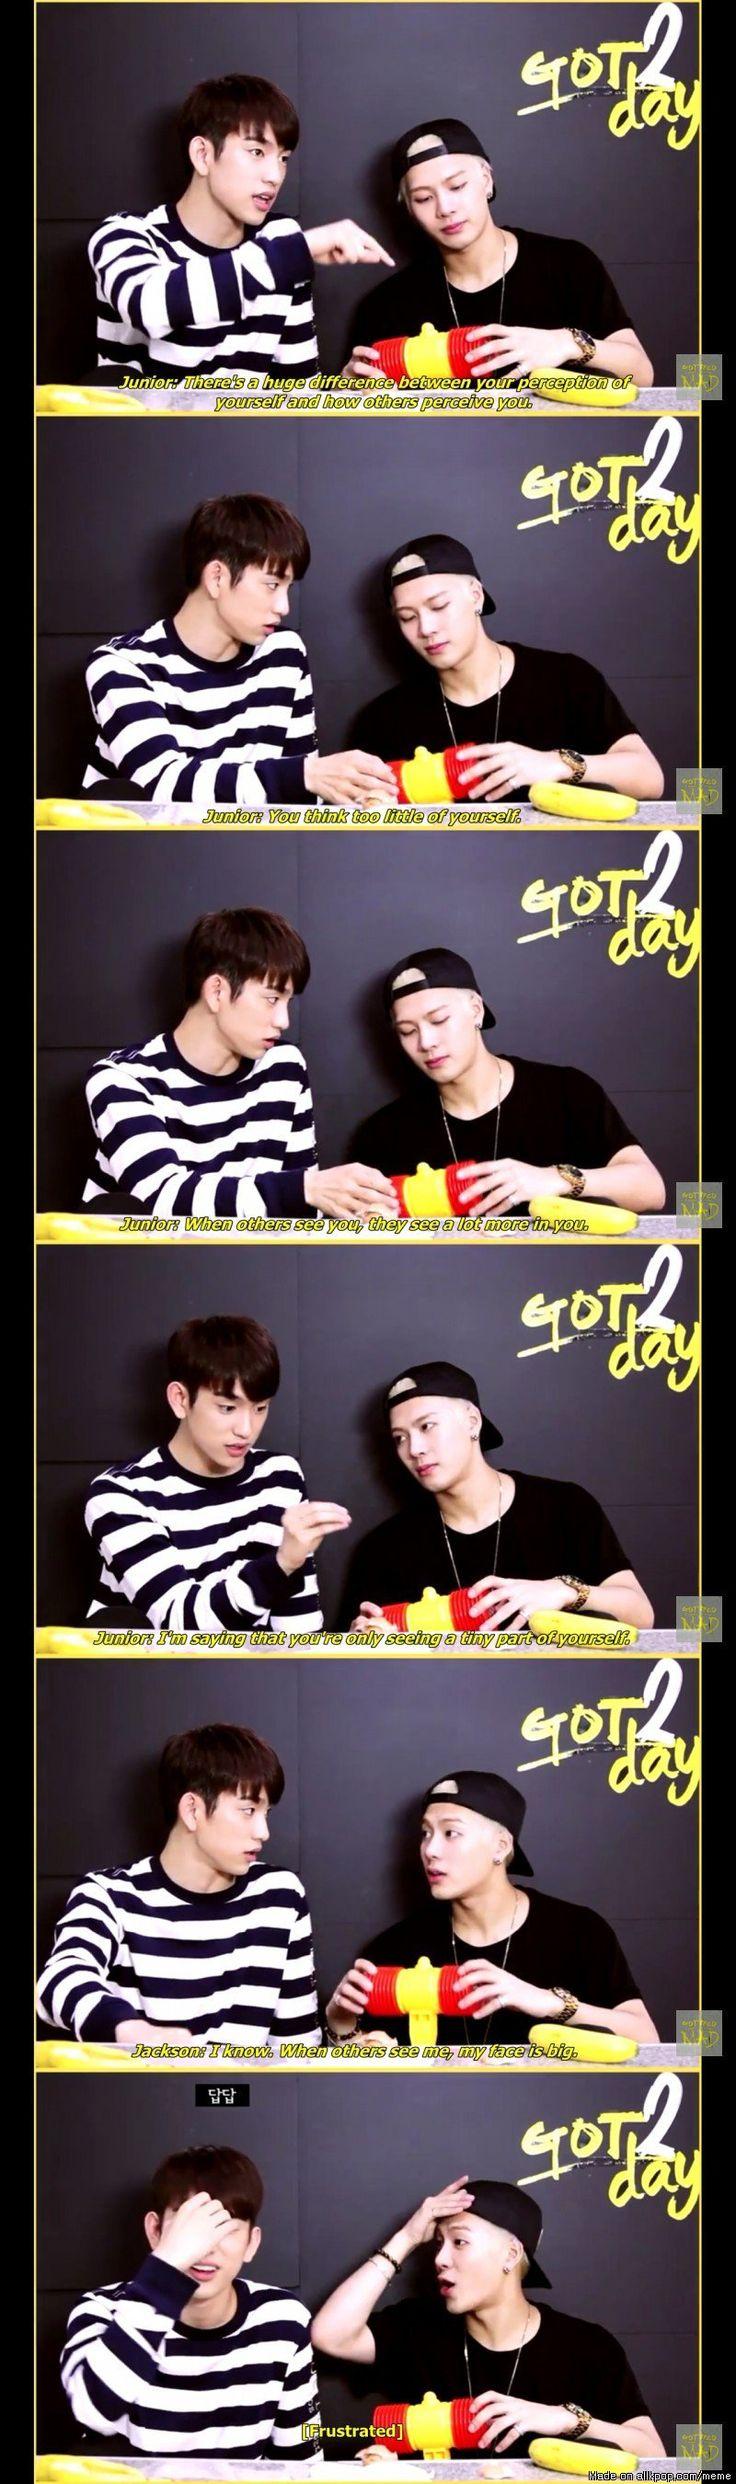 G O T 7 • Junior x Jackson • If I was Junior I'd get really pissed. Oh Jackson Hahaha #Got7 #JYP #Kpop